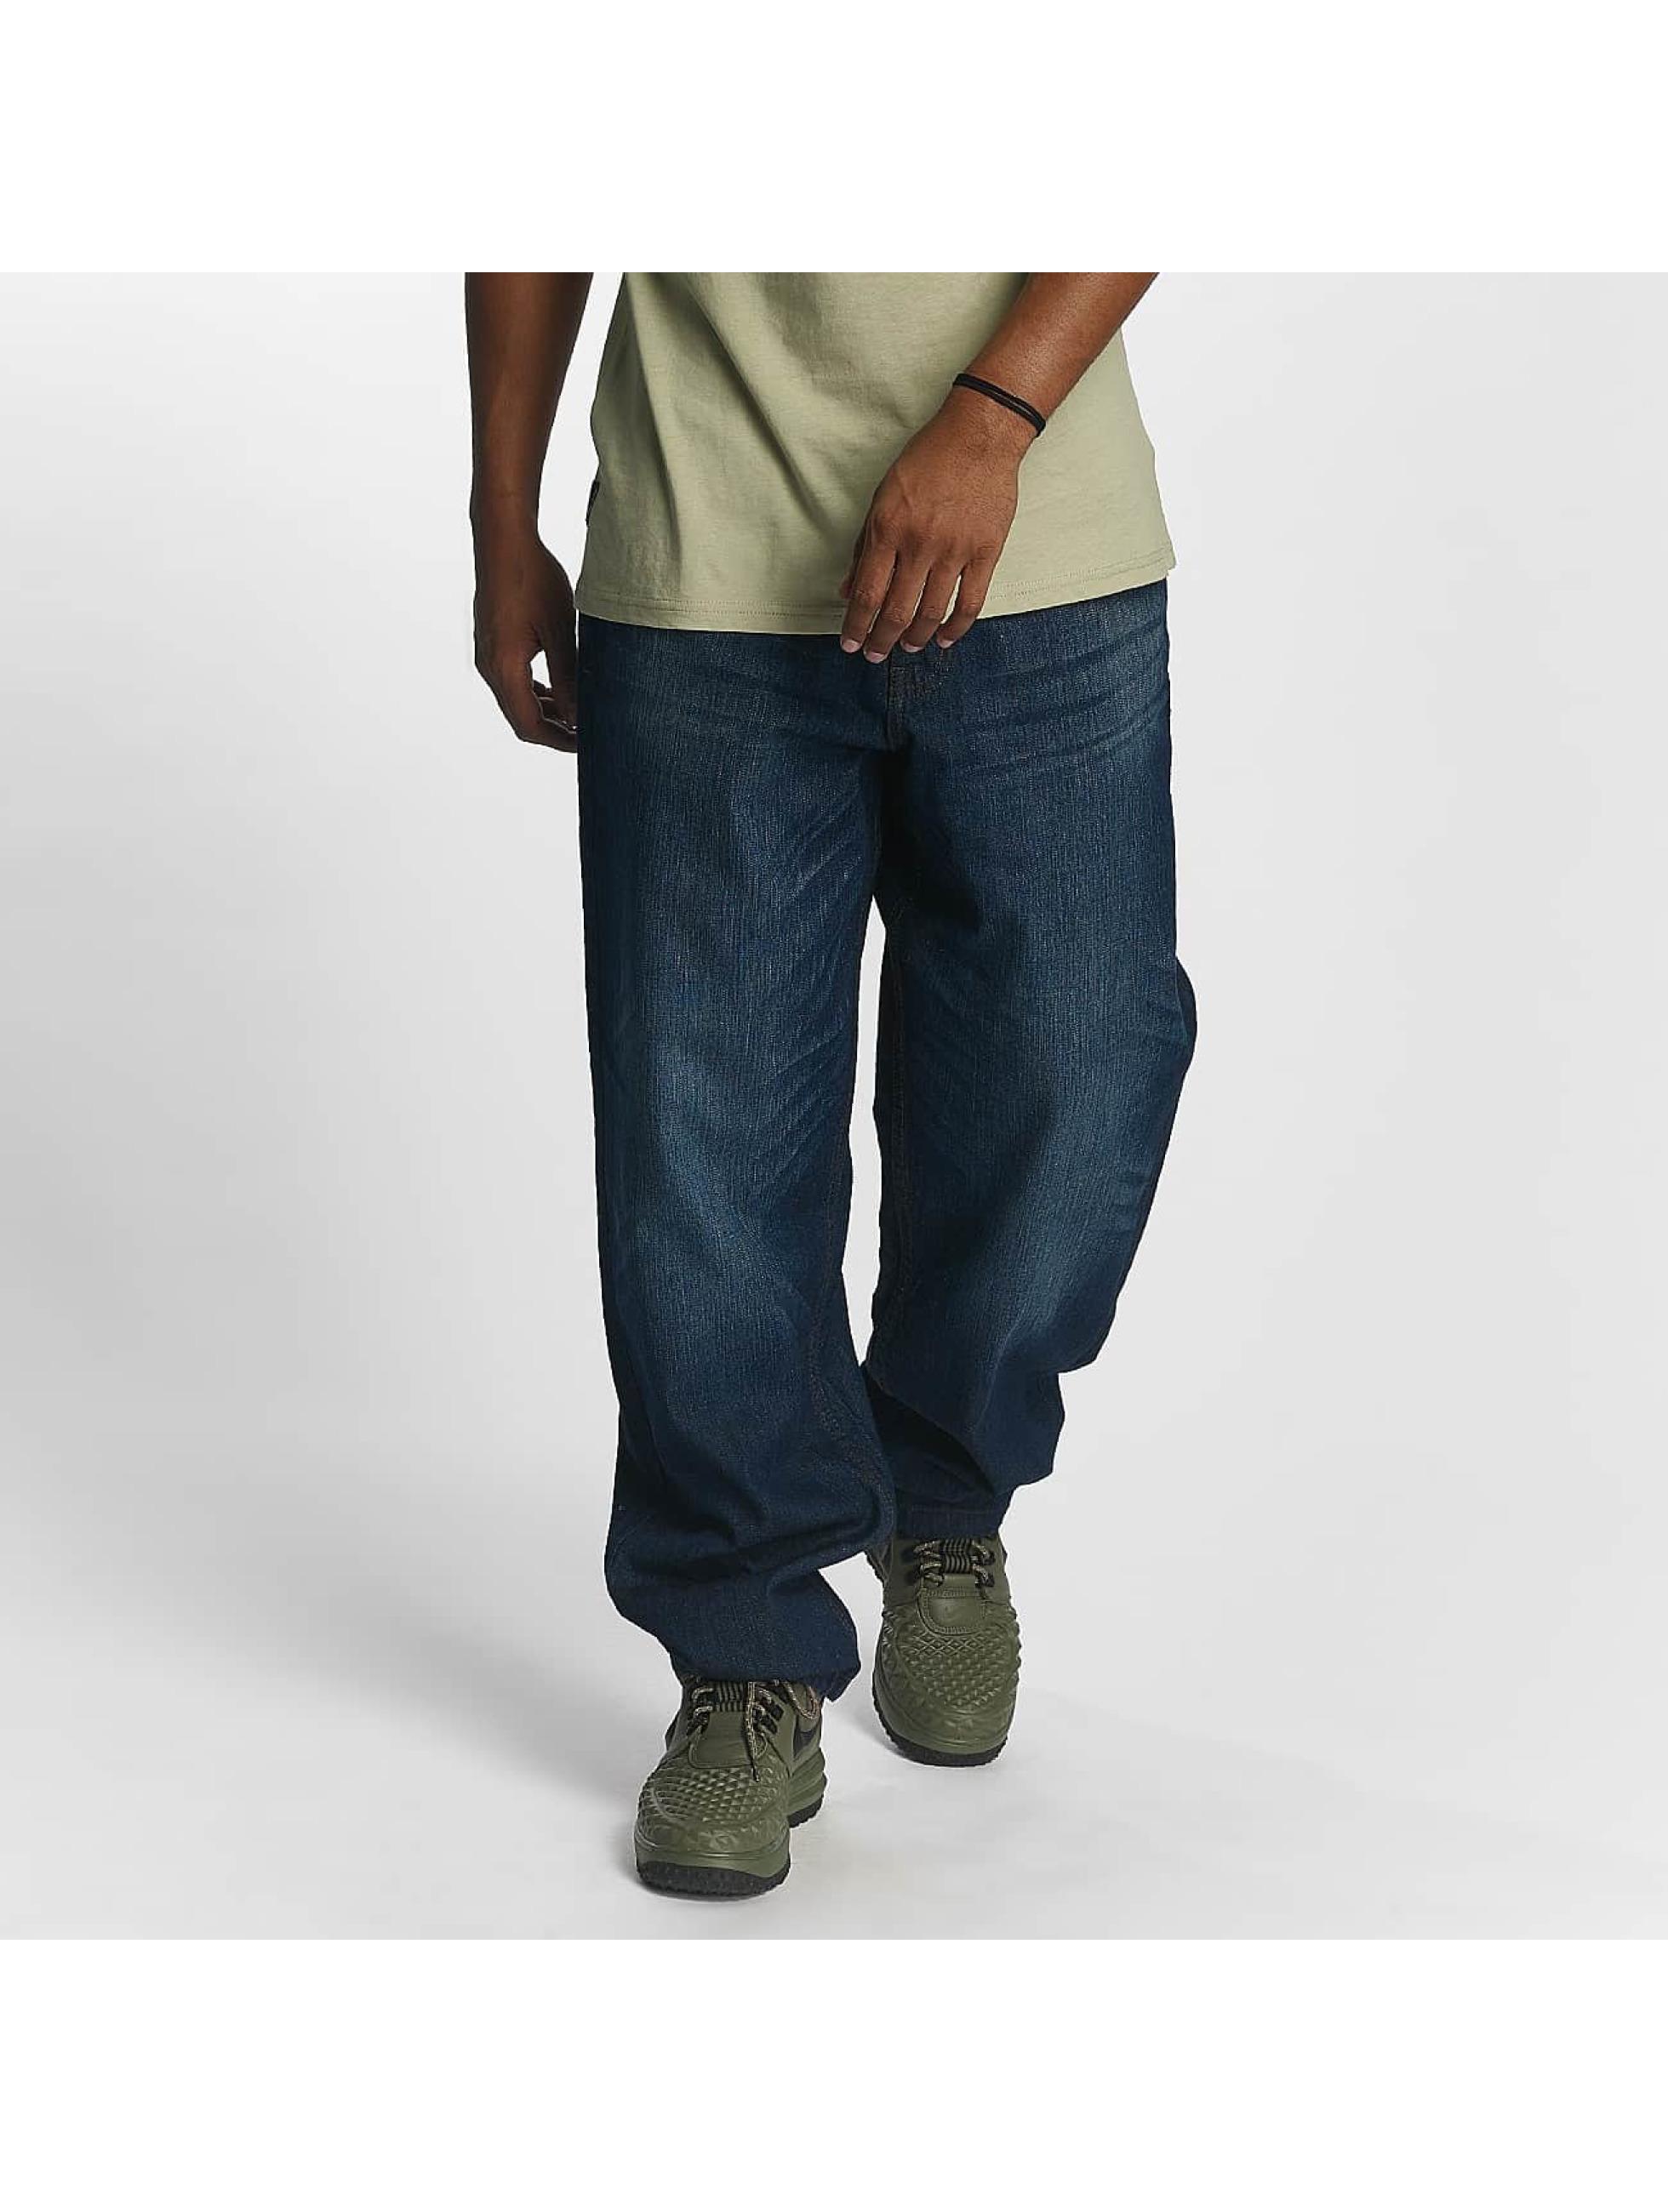 Rocawear / Baggy Baggy Fit in blue W 42